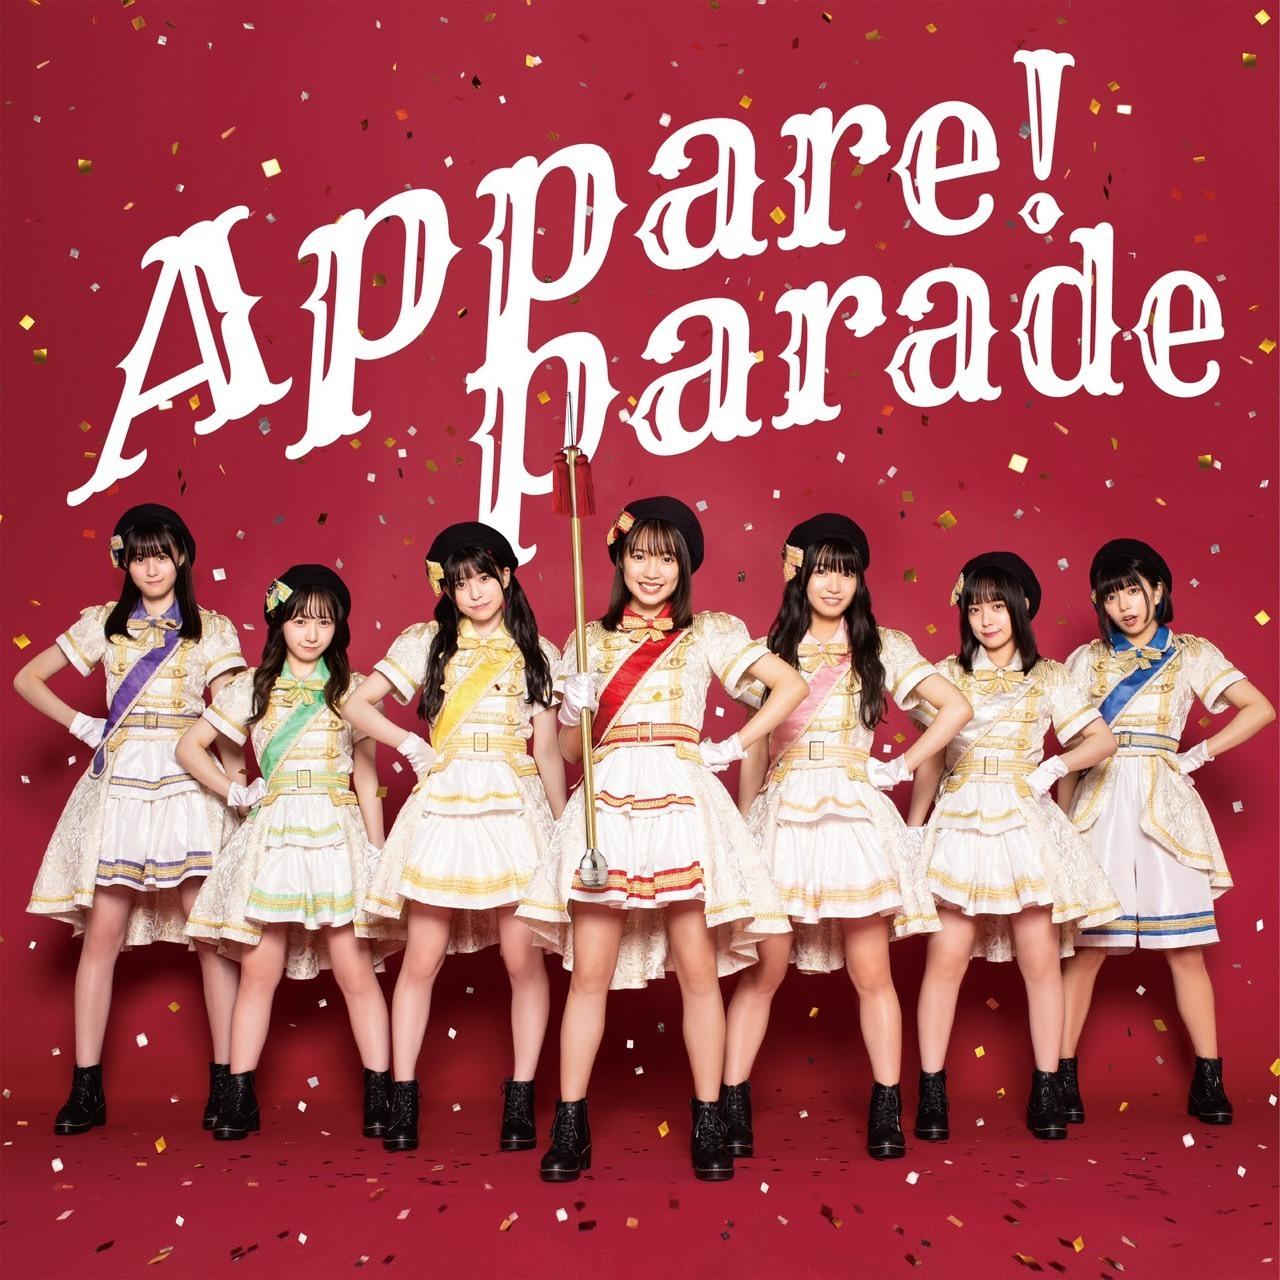 Appare!「Appare! Parade」